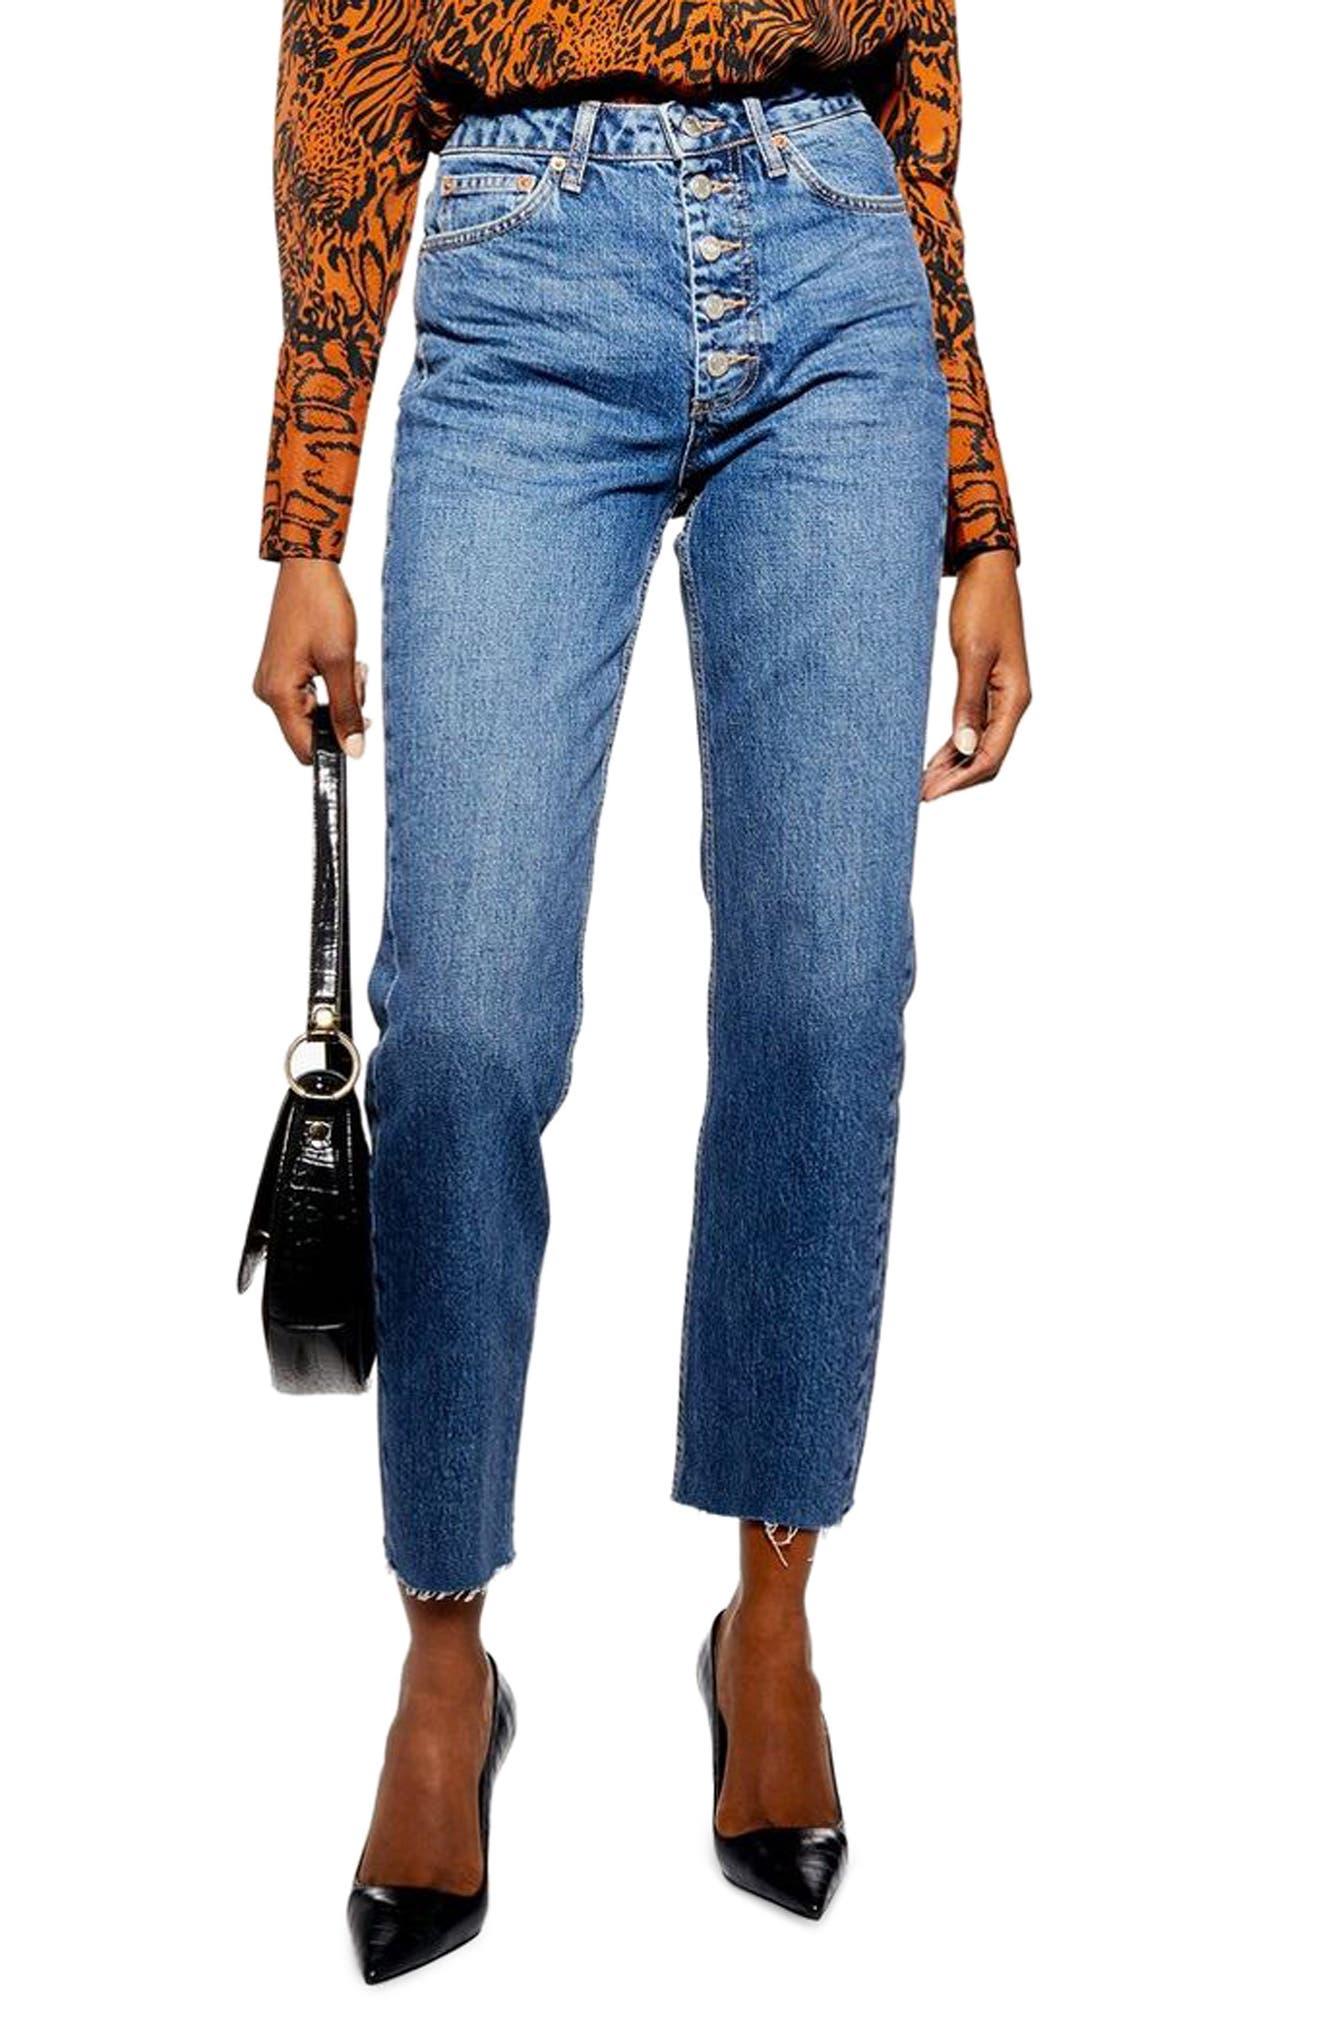 TOPSHOP, Exposed Button Raw Hem Straight Leg Jeans, Main thumbnail 1, color, INDIGO